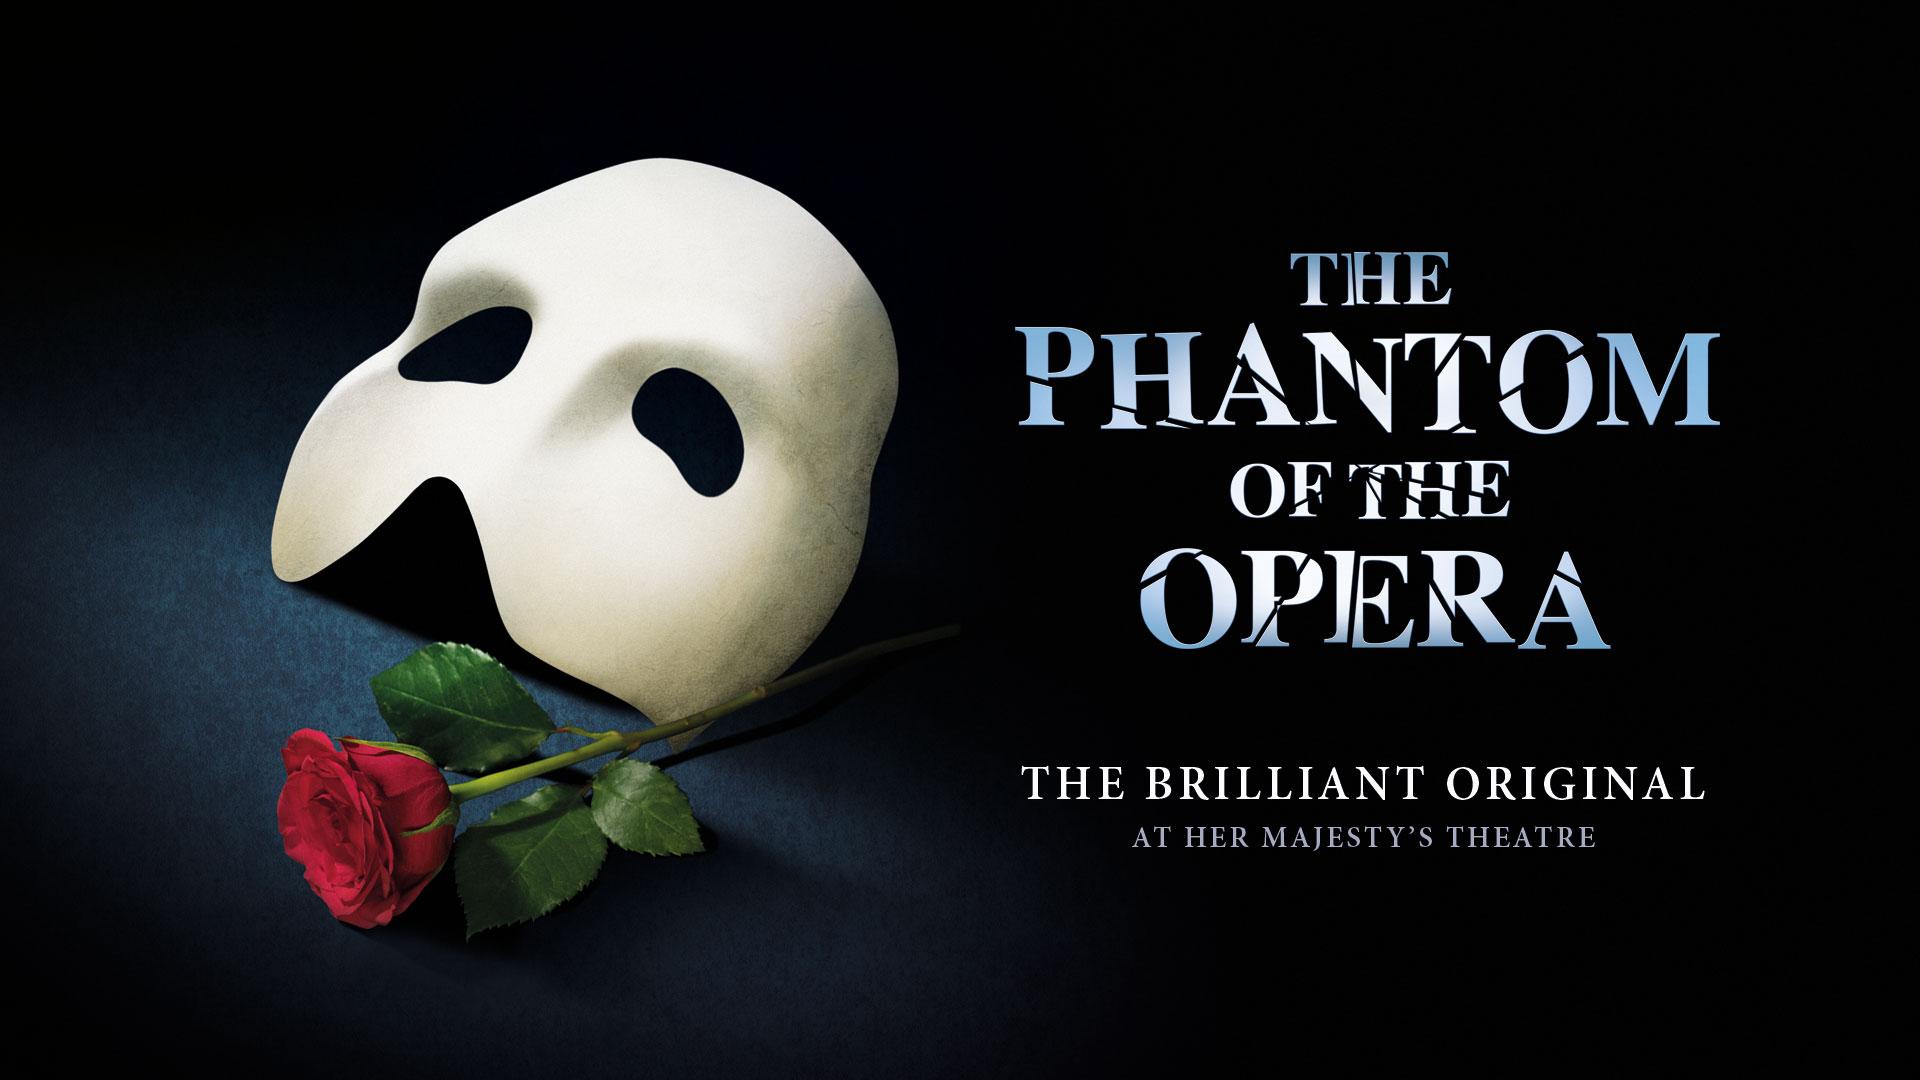 The Phantom of the Opera at Her Majesty's Theatre. Image courtesy of Cameron Mackintosh Ltd.